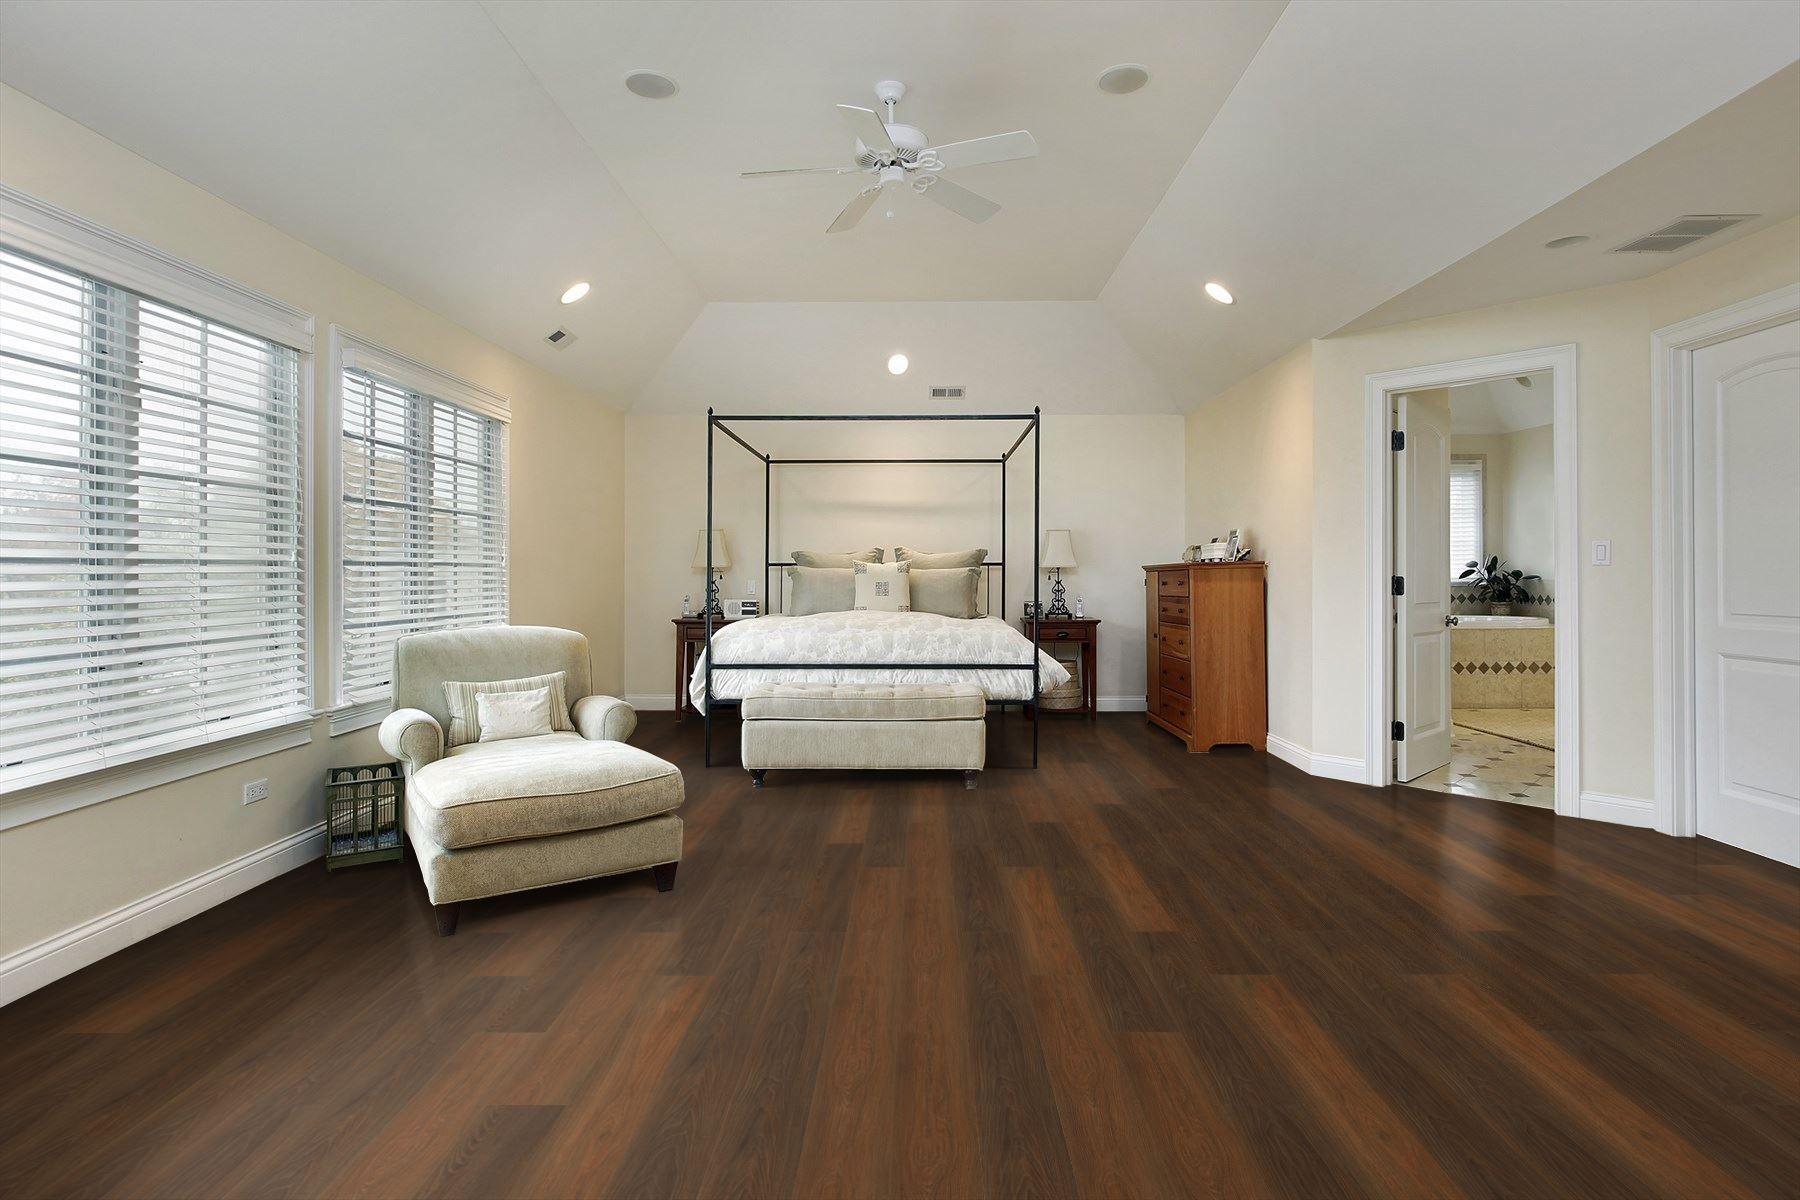 Farmland Oak Laminate Flooring Oak Laminate White Bedroom Design Flooring